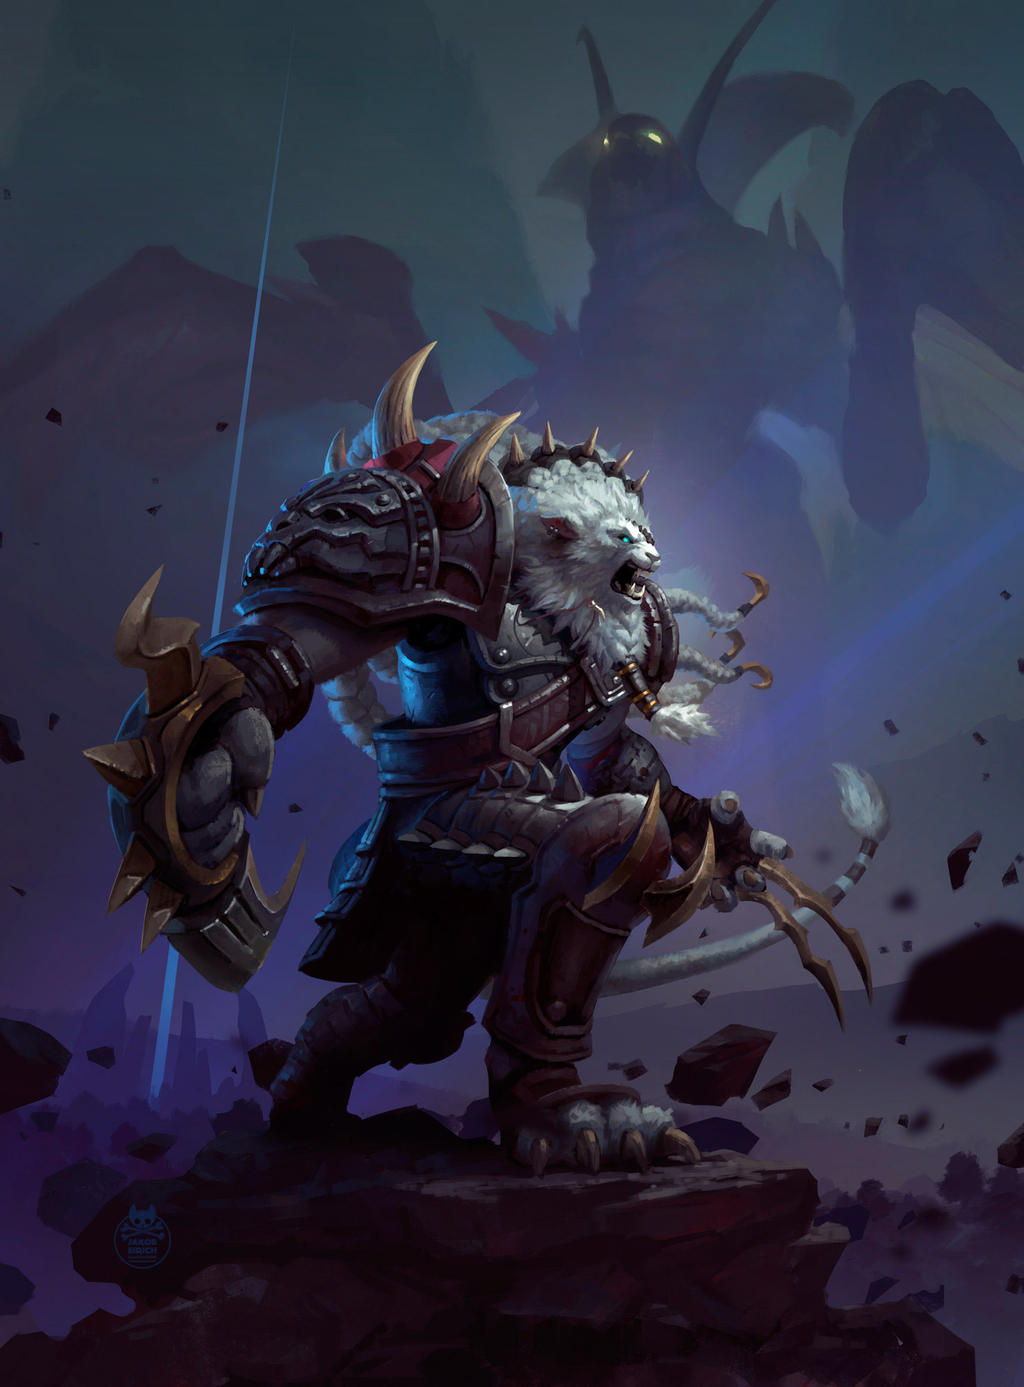 rengar__league_of_legends_by_yakonusuke-